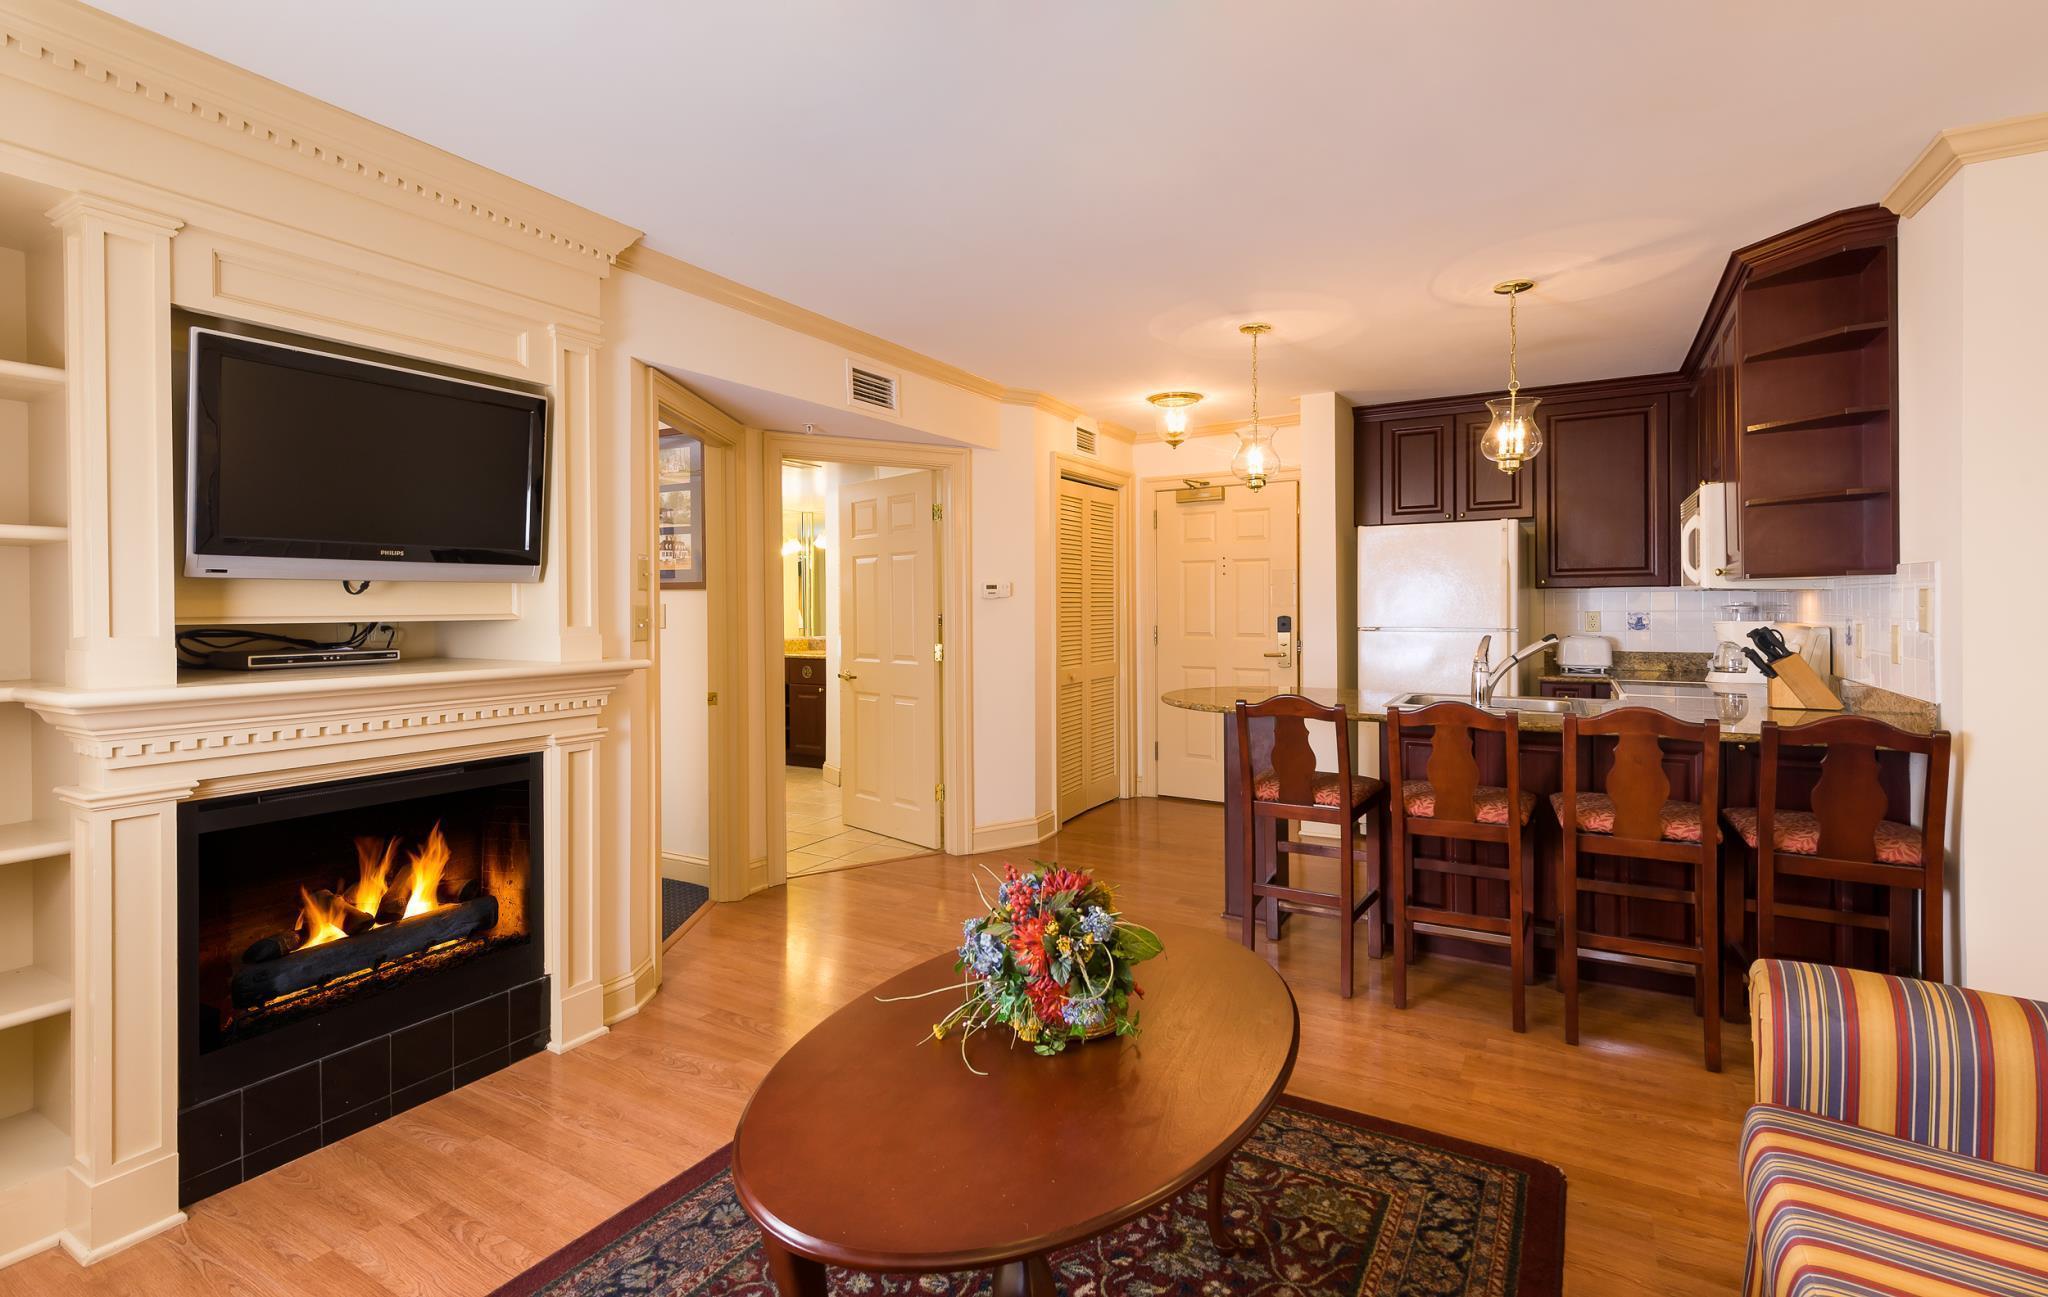 1-Bedroom Suite Westgate Williamsburg Resort